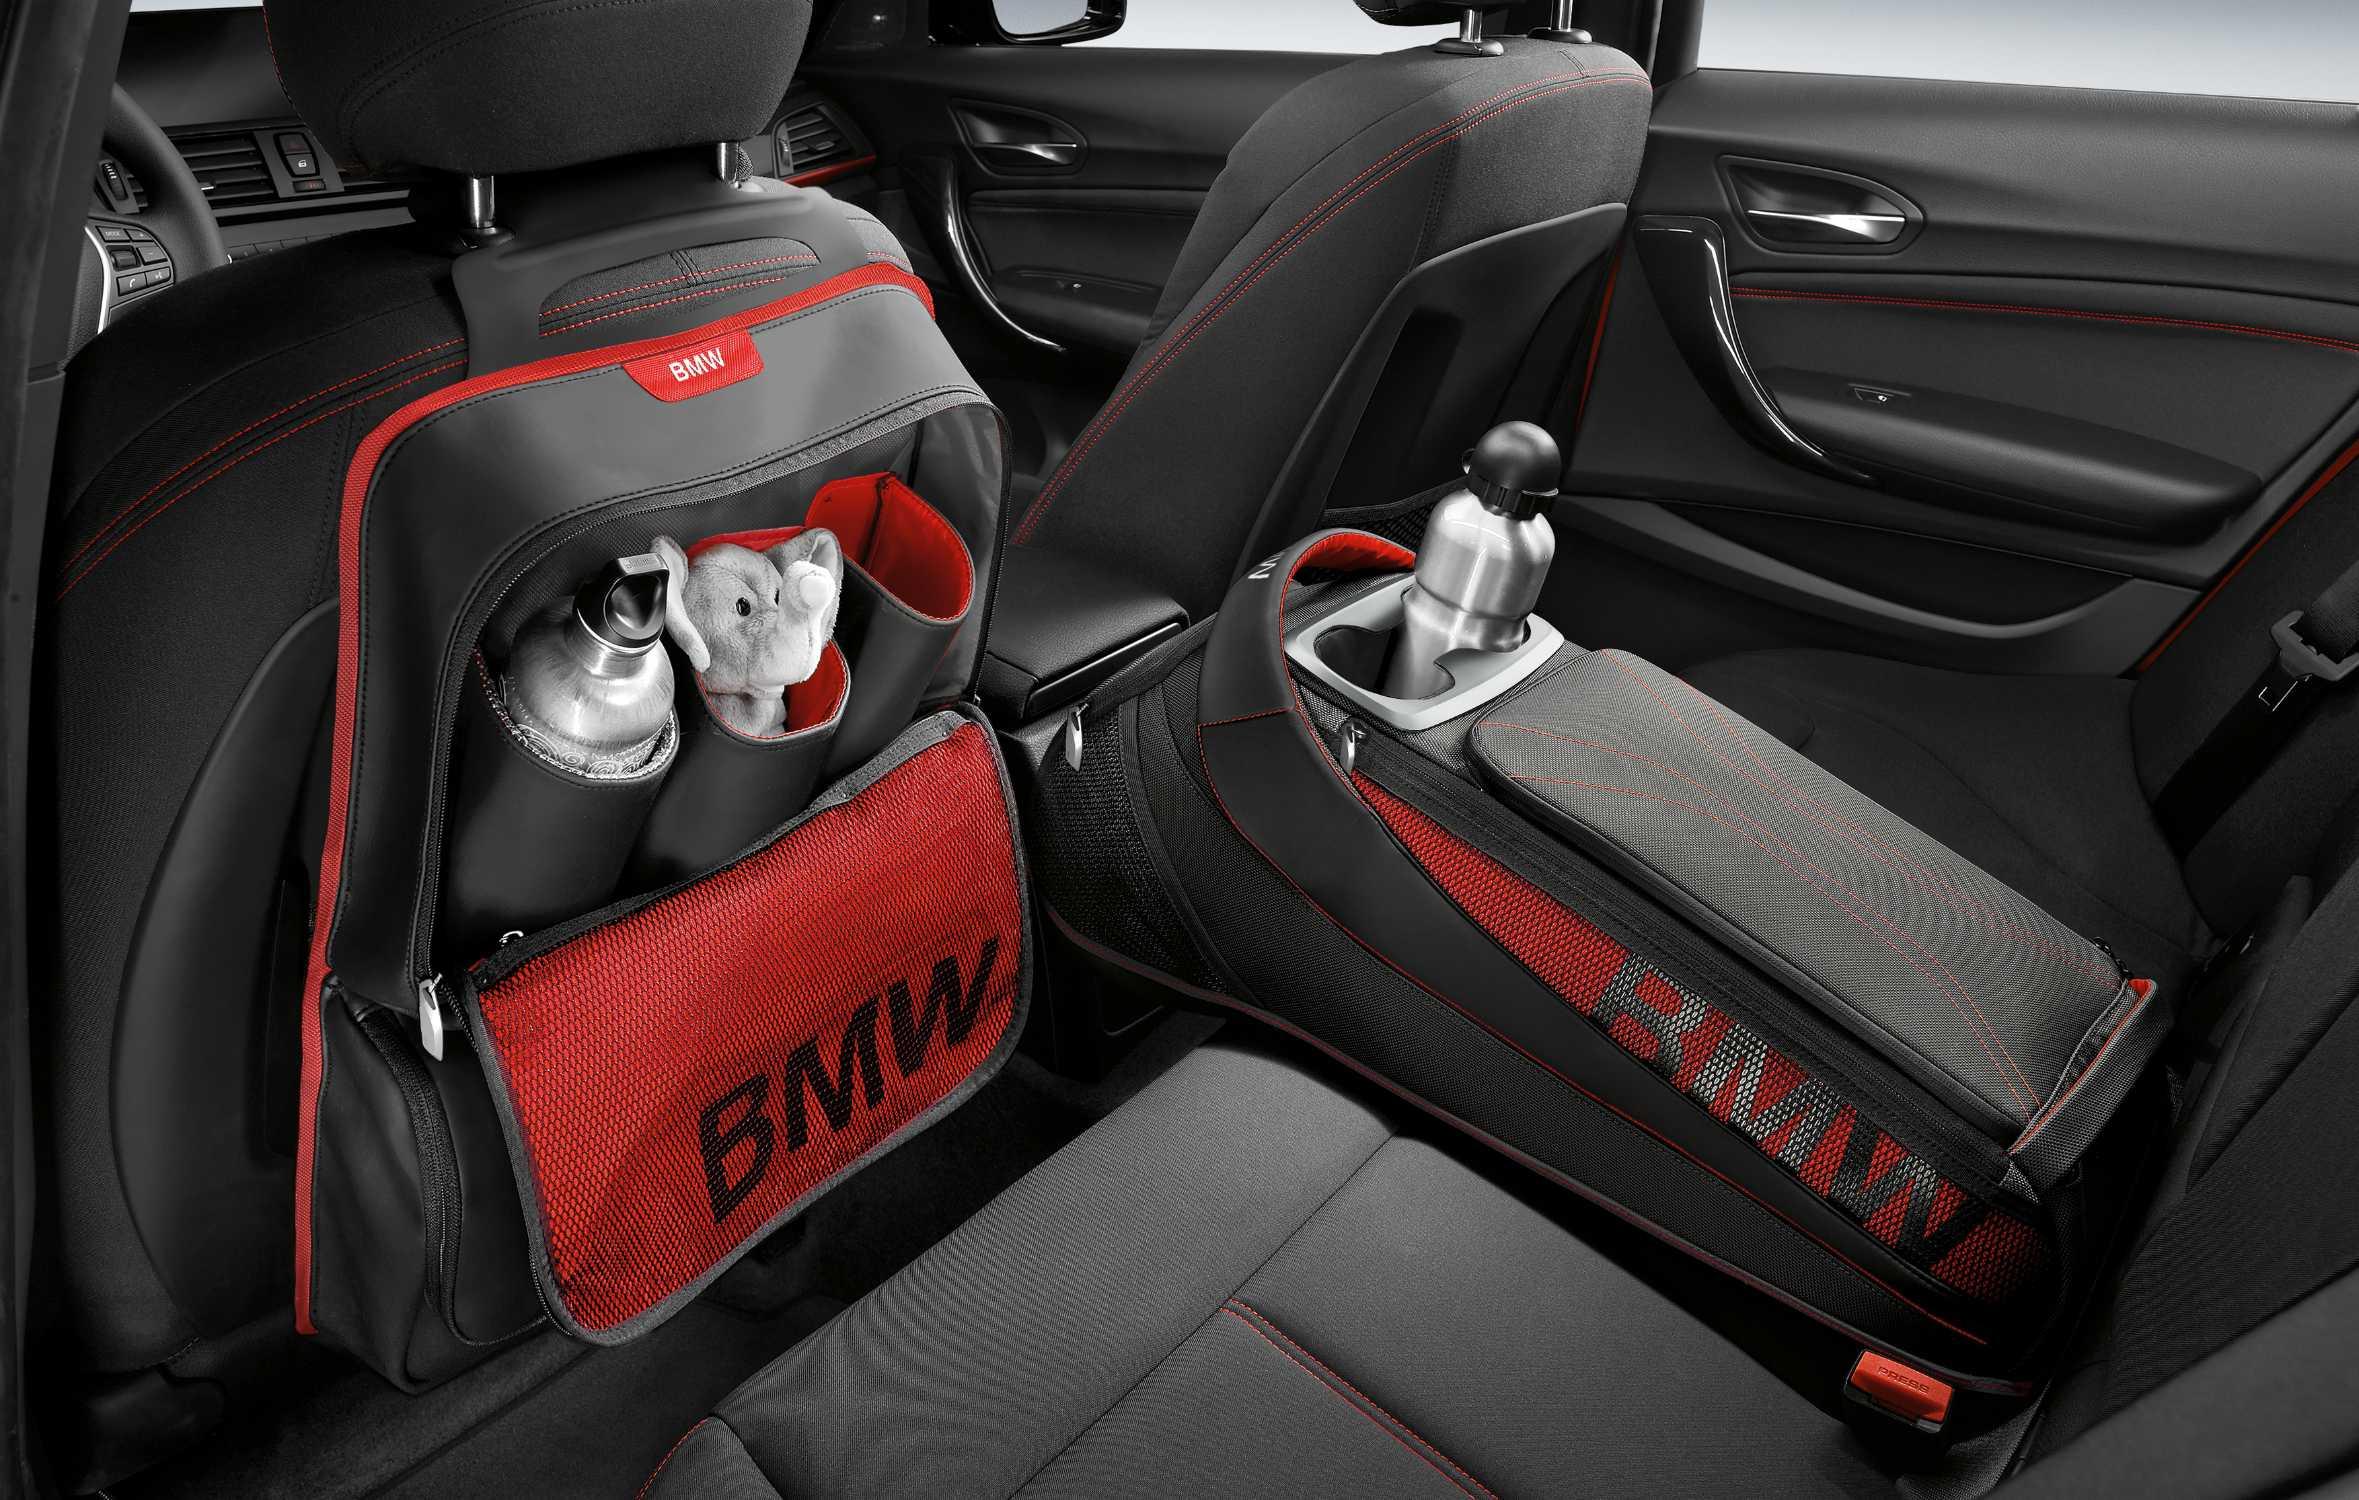 bmw 1 series accessories storage bag fond sport line 09 2011. Black Bedroom Furniture Sets. Home Design Ideas